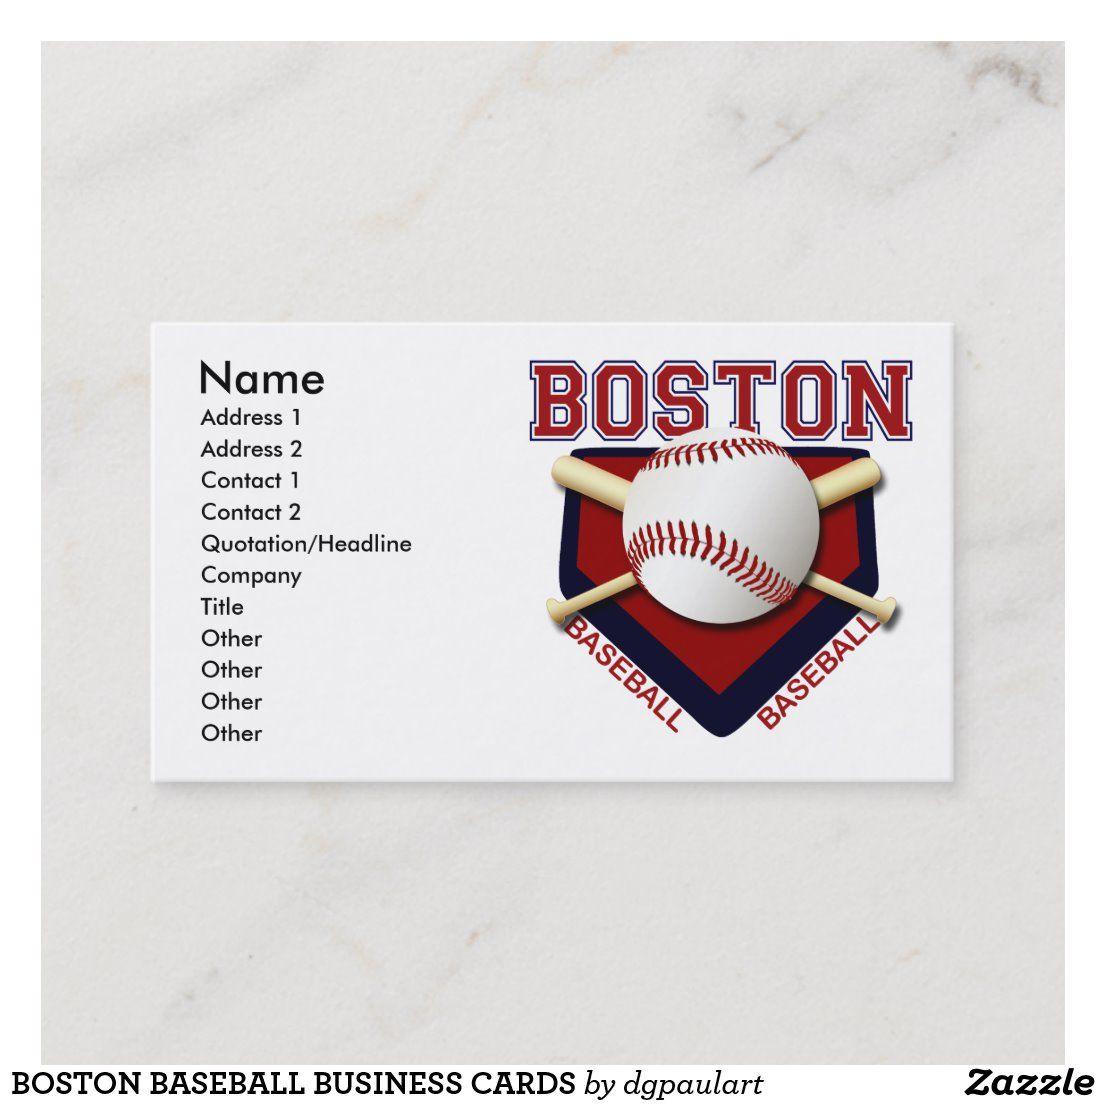 Boston Baseball Business Cards Zazzle Com Baseball Business Card Boston Baseball Baseball